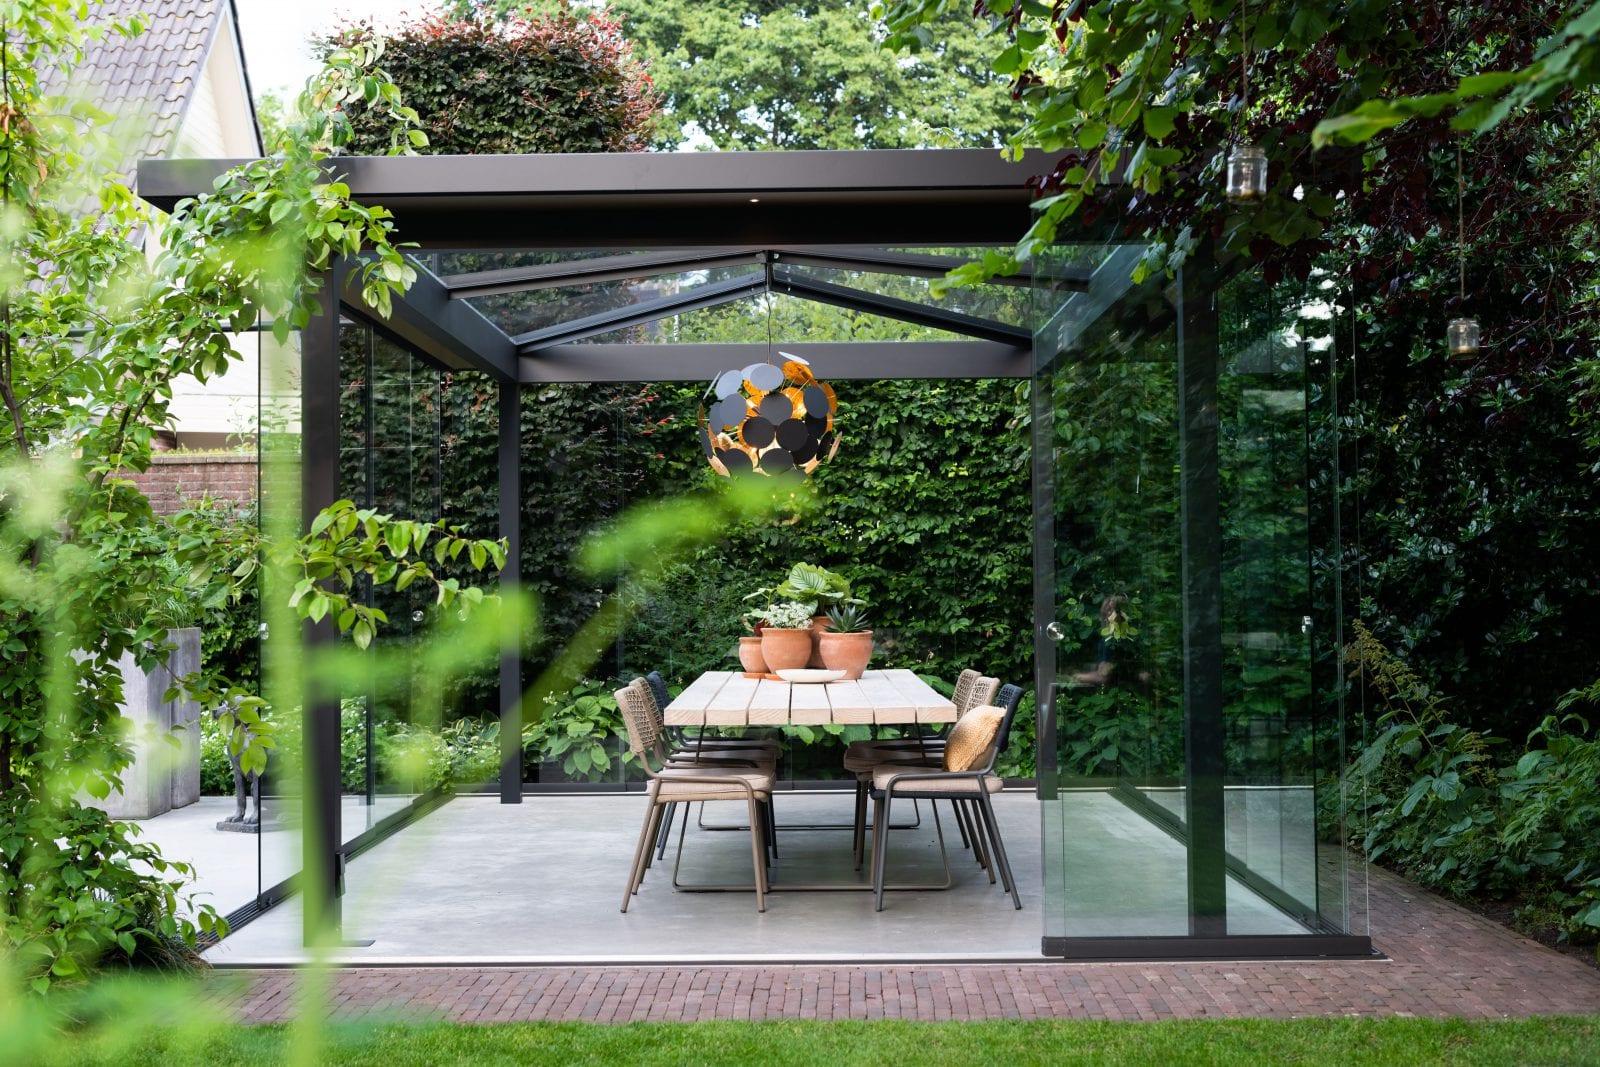 Luxe tuinkamer vrijstaande overkapping Barneveld